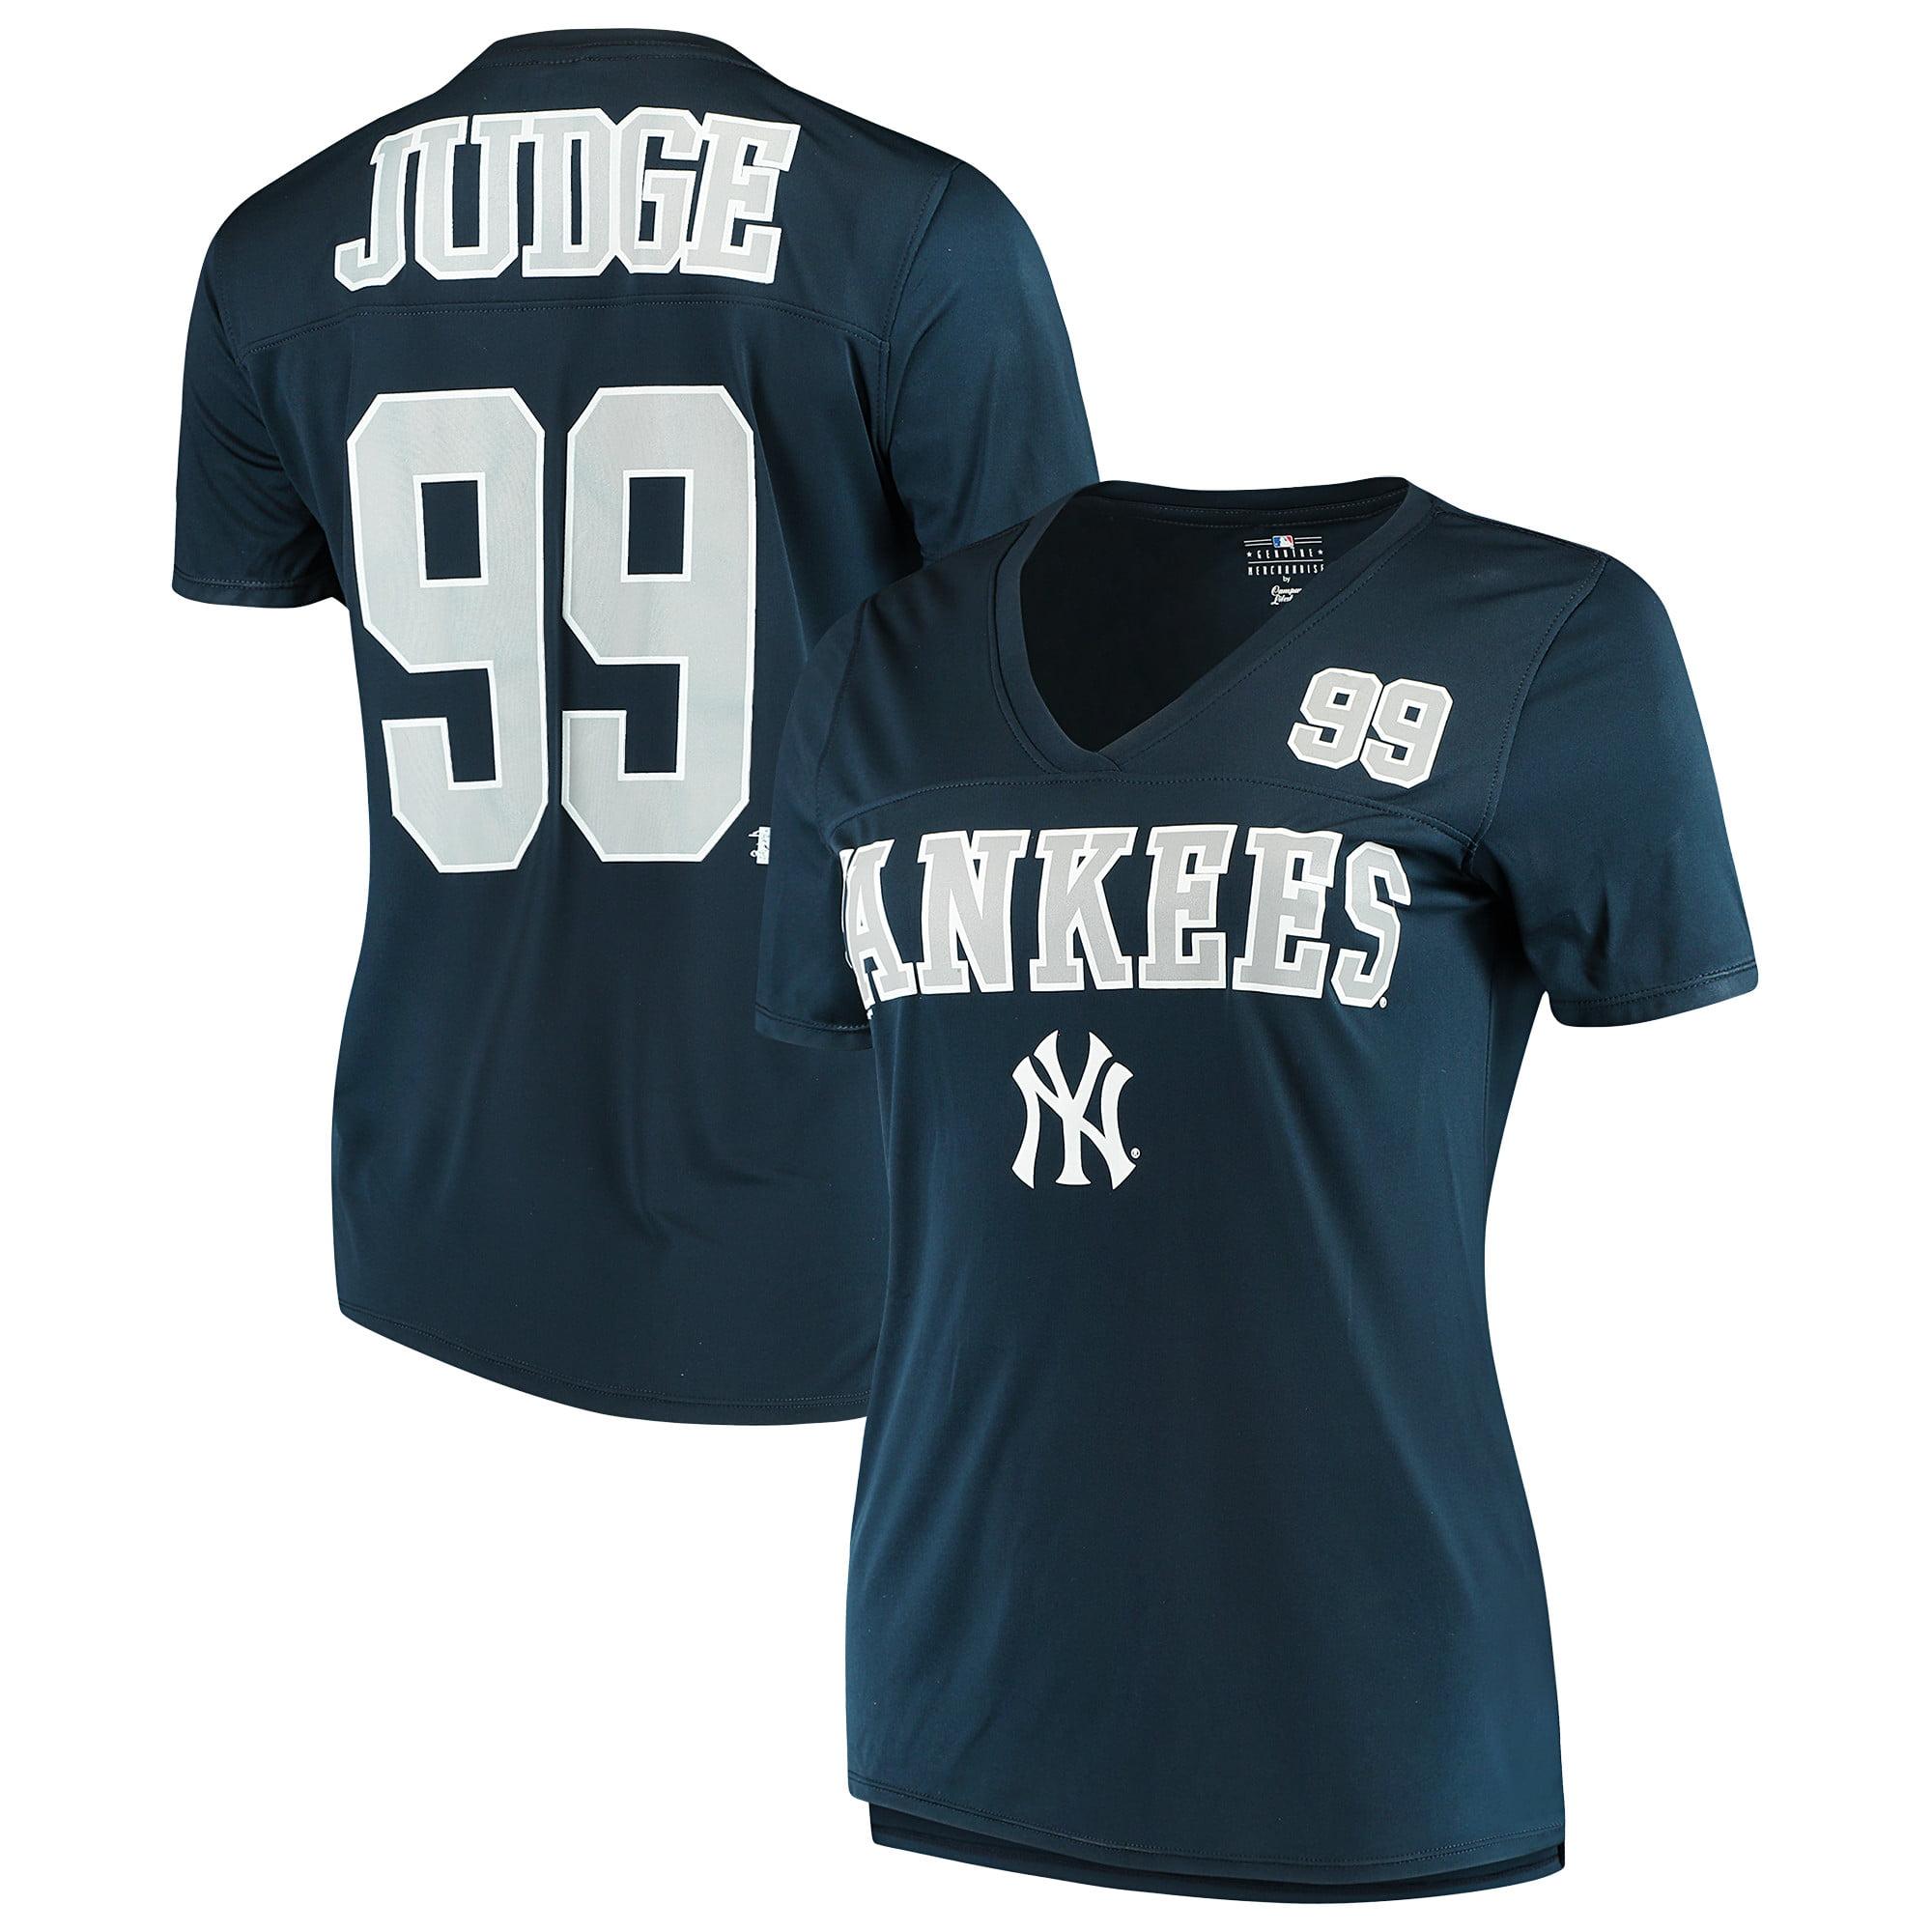 Women's New Era Aaron Judge Navy New York Yankees Name & Number T-Shirt